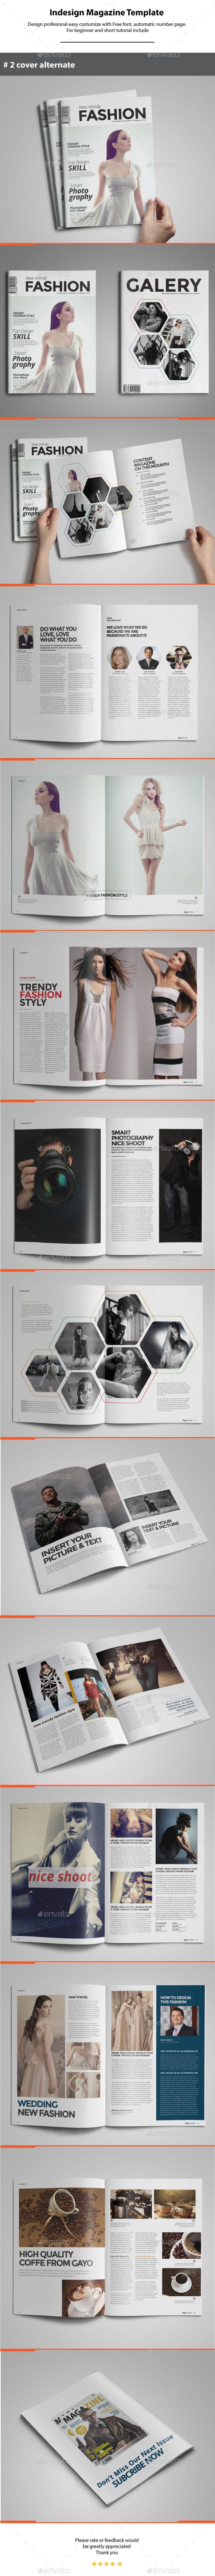 GraphicRiver Indesign Magazine Template 11553758